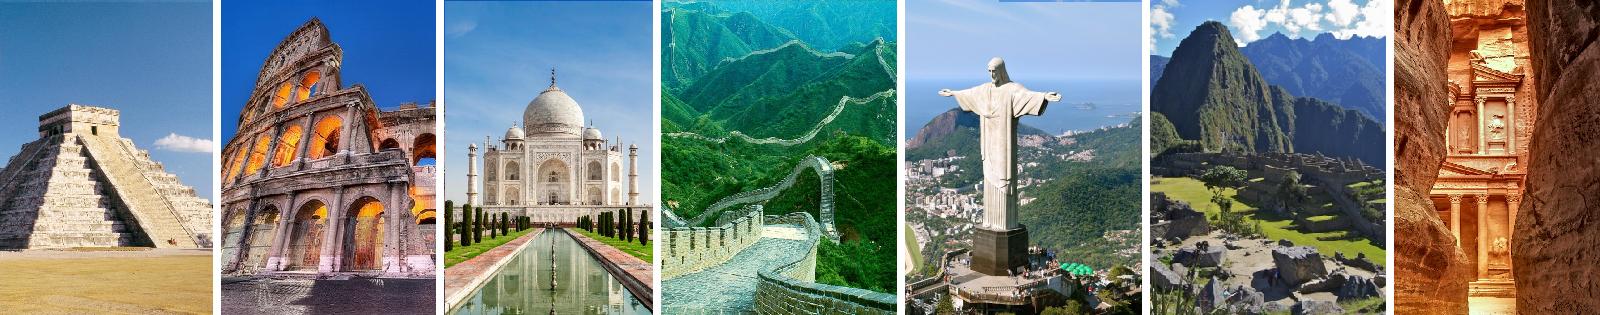 Licencia real id diary of trips for Fondos de pantalla 7 maravillas del mundo